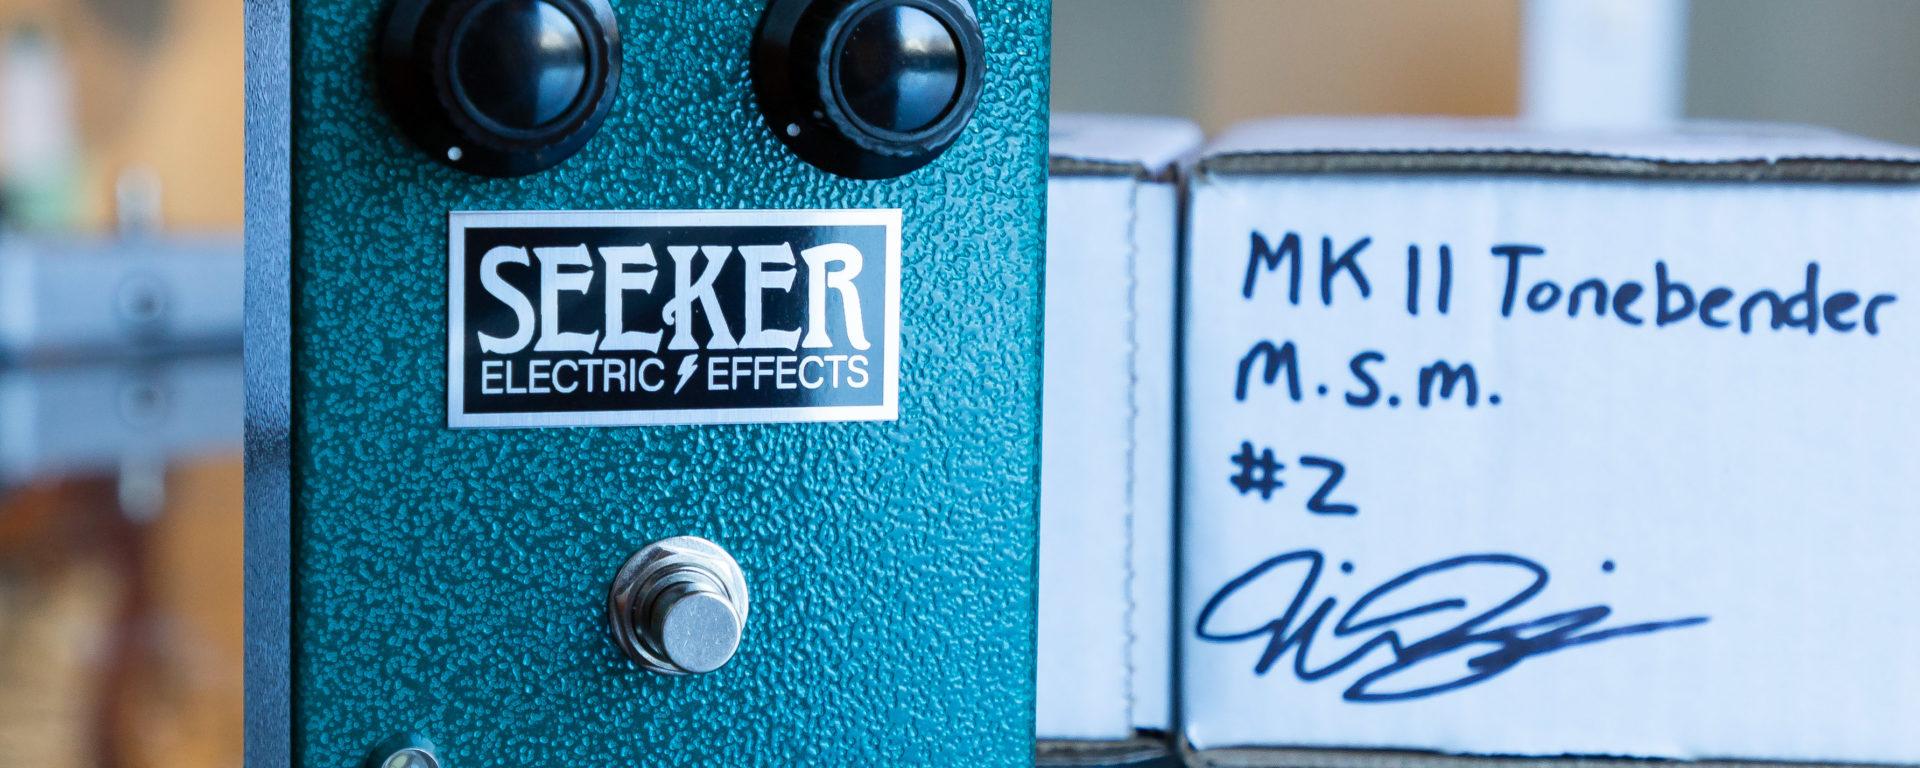 Seeker Electric Effects - MK Tone Bender